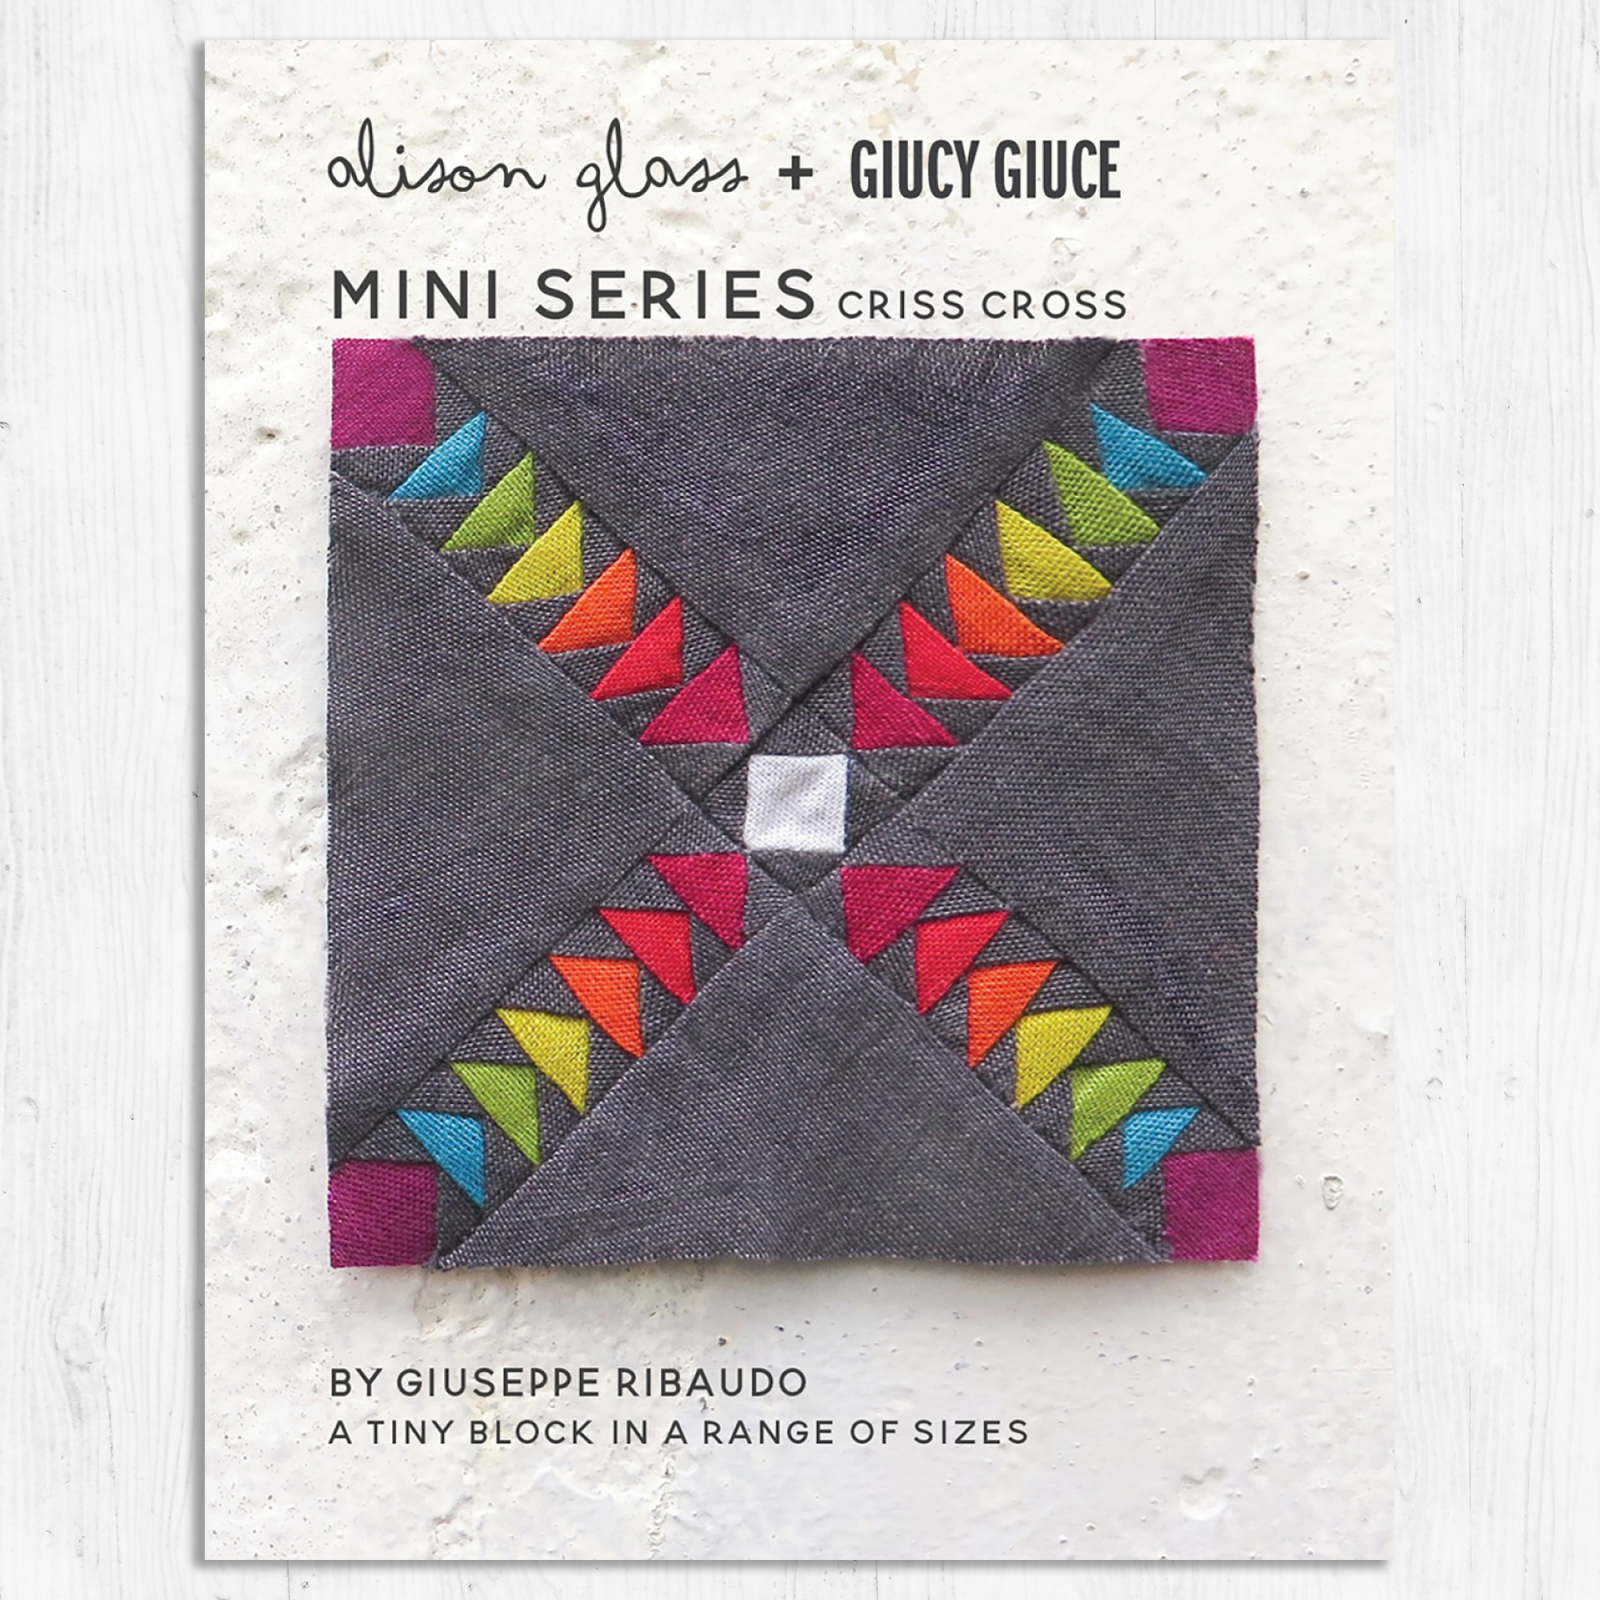 Alison Glass + Giucy Giuce - Mini Series - Criss Cross